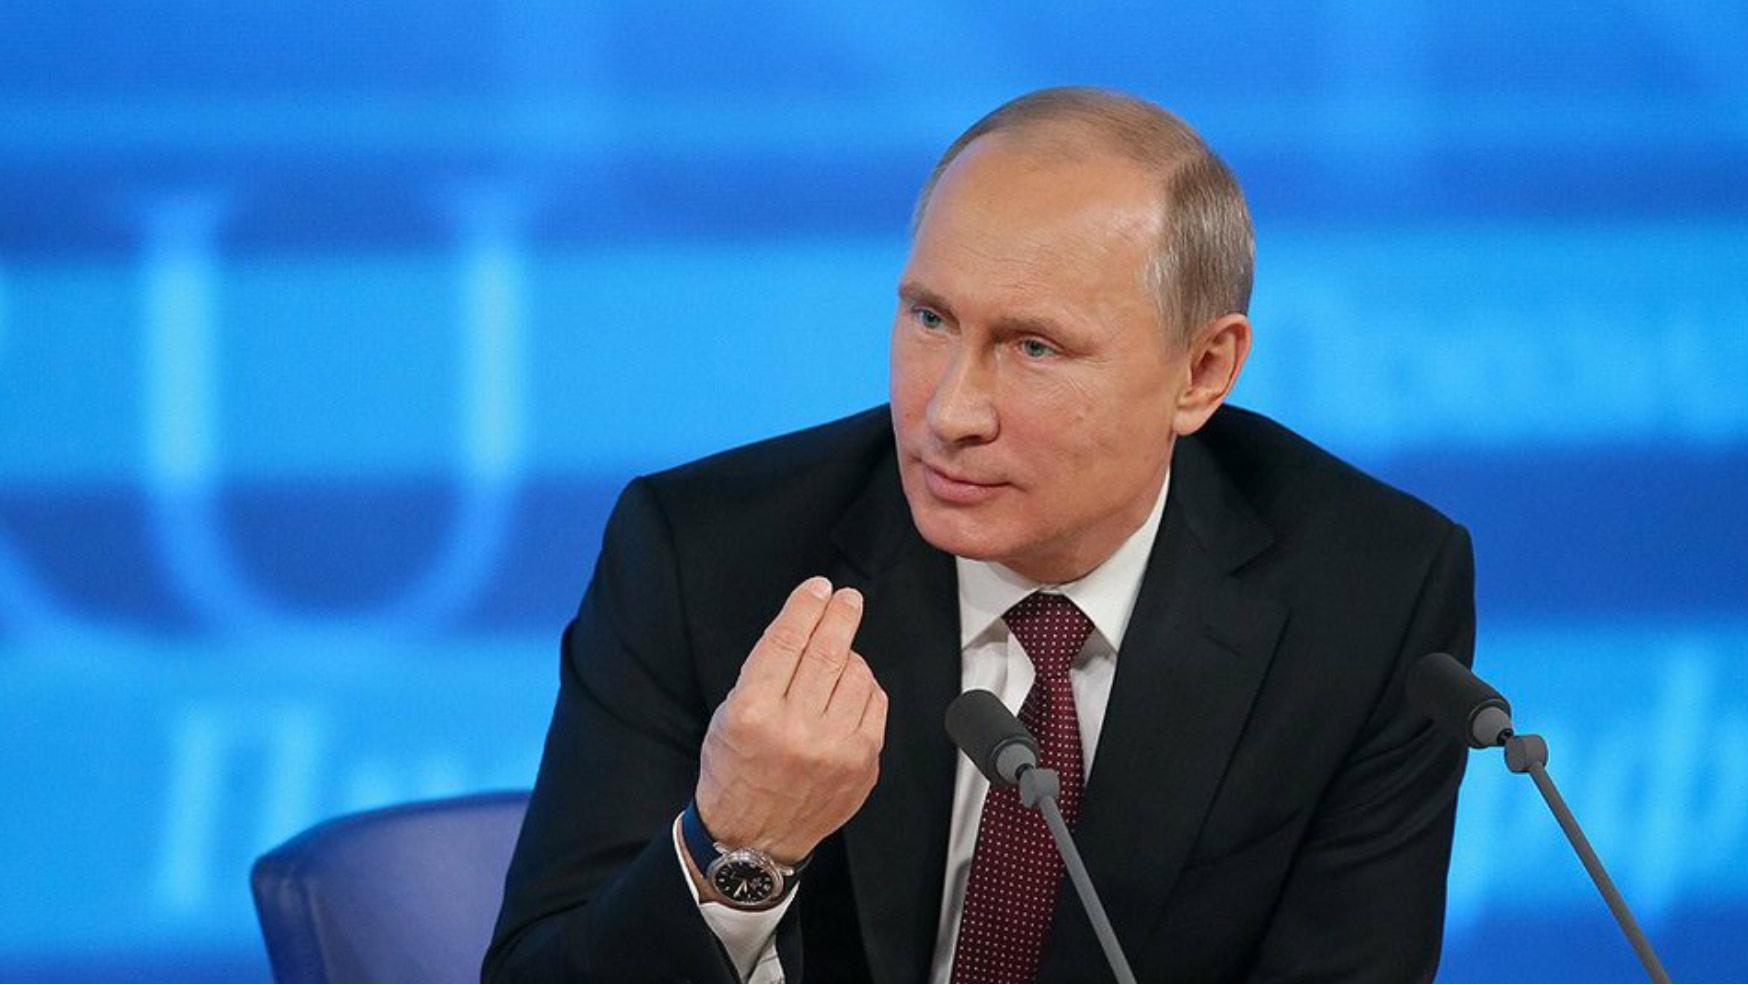 پوتین روسییانین پریوریتئتینی آچیقلادی